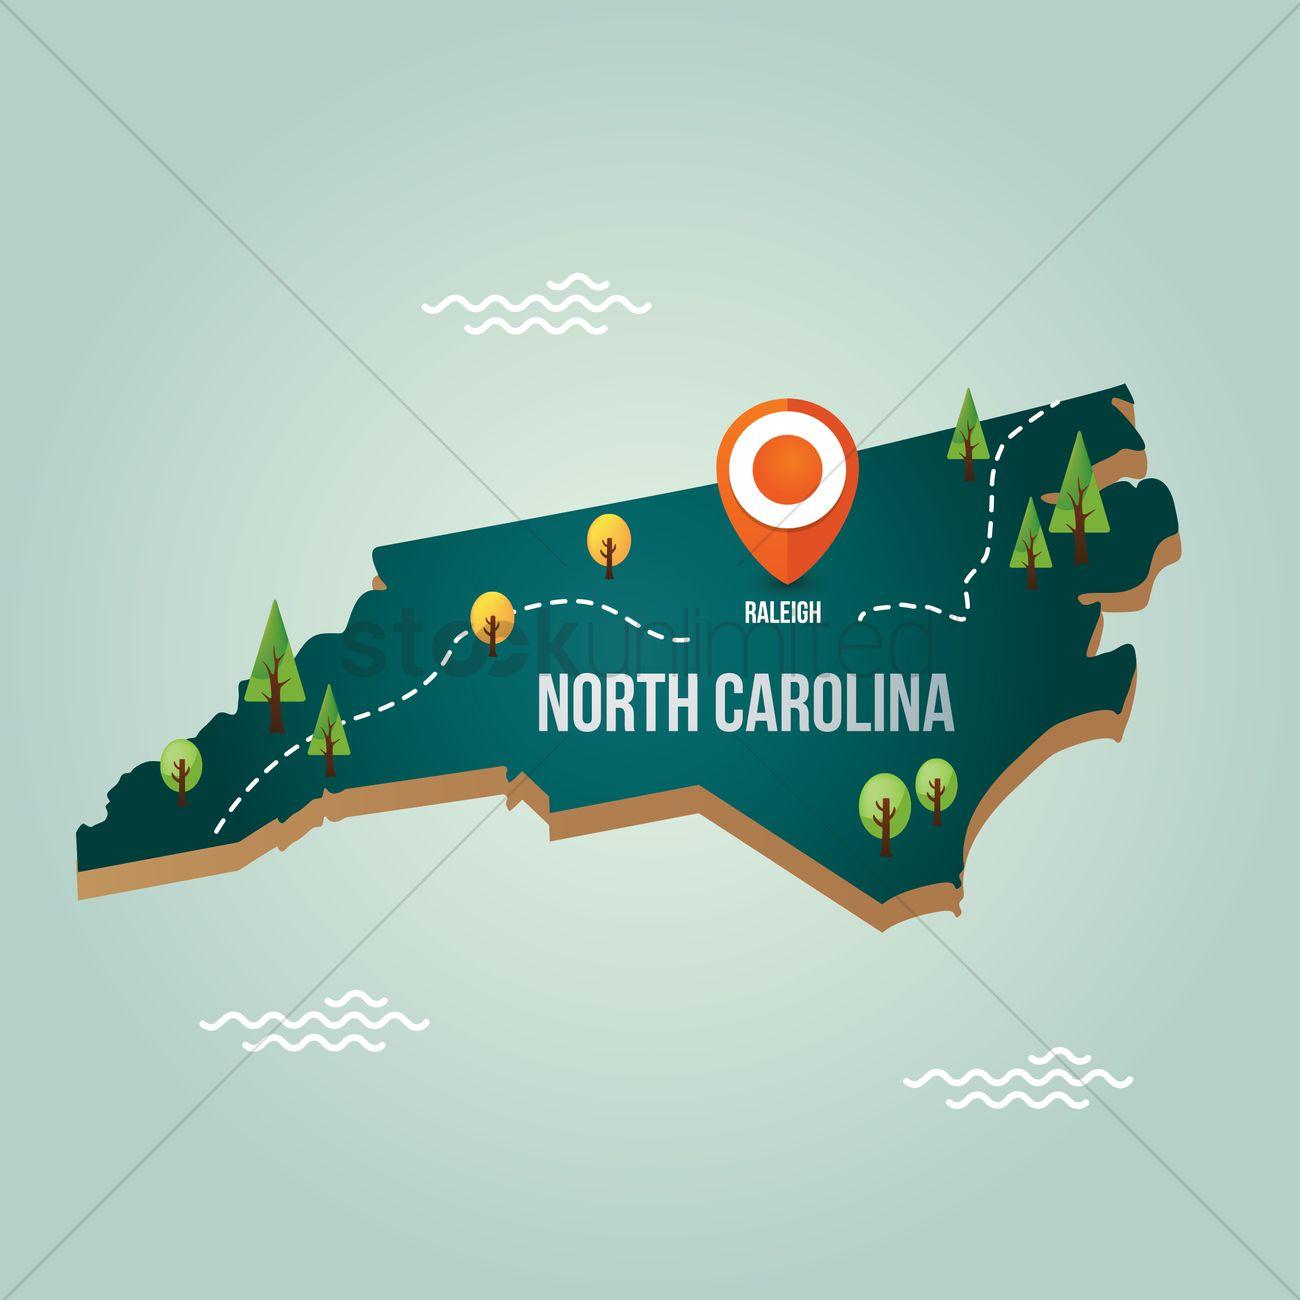 North Carolina Map With Capital City Vector Image - North carolina map of cities